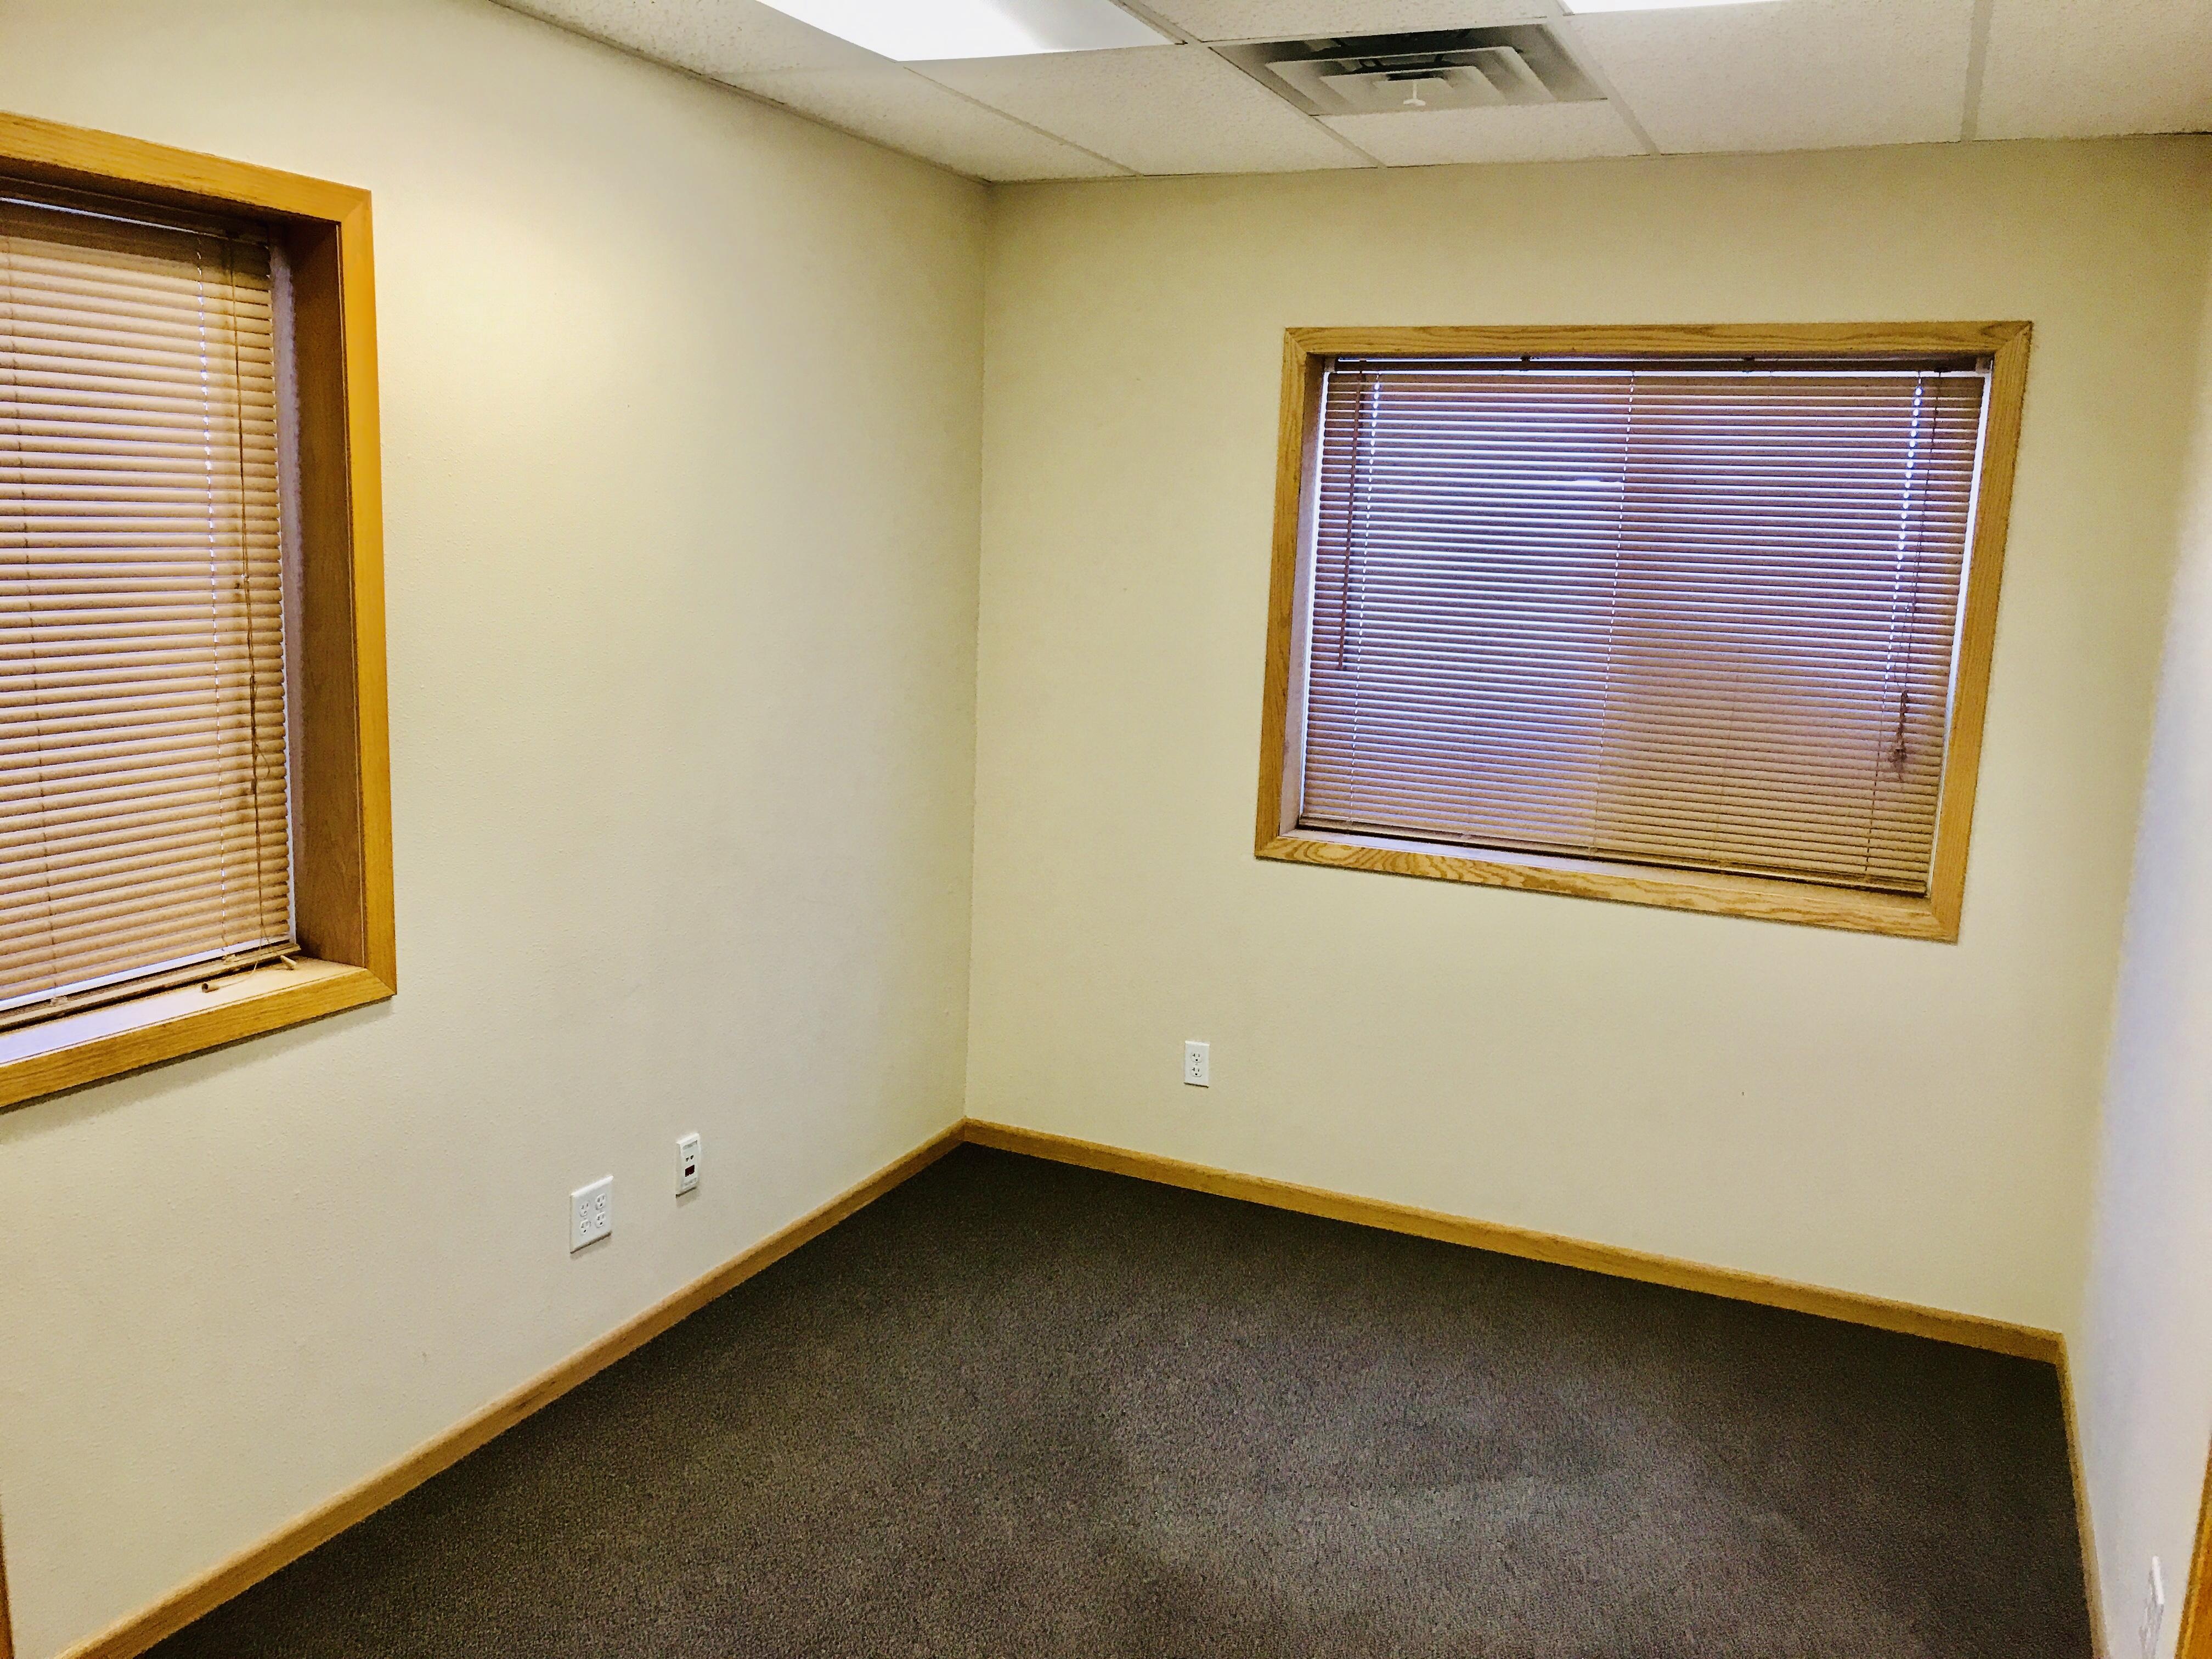 9x12.5' Office For Rent - 1st Floor